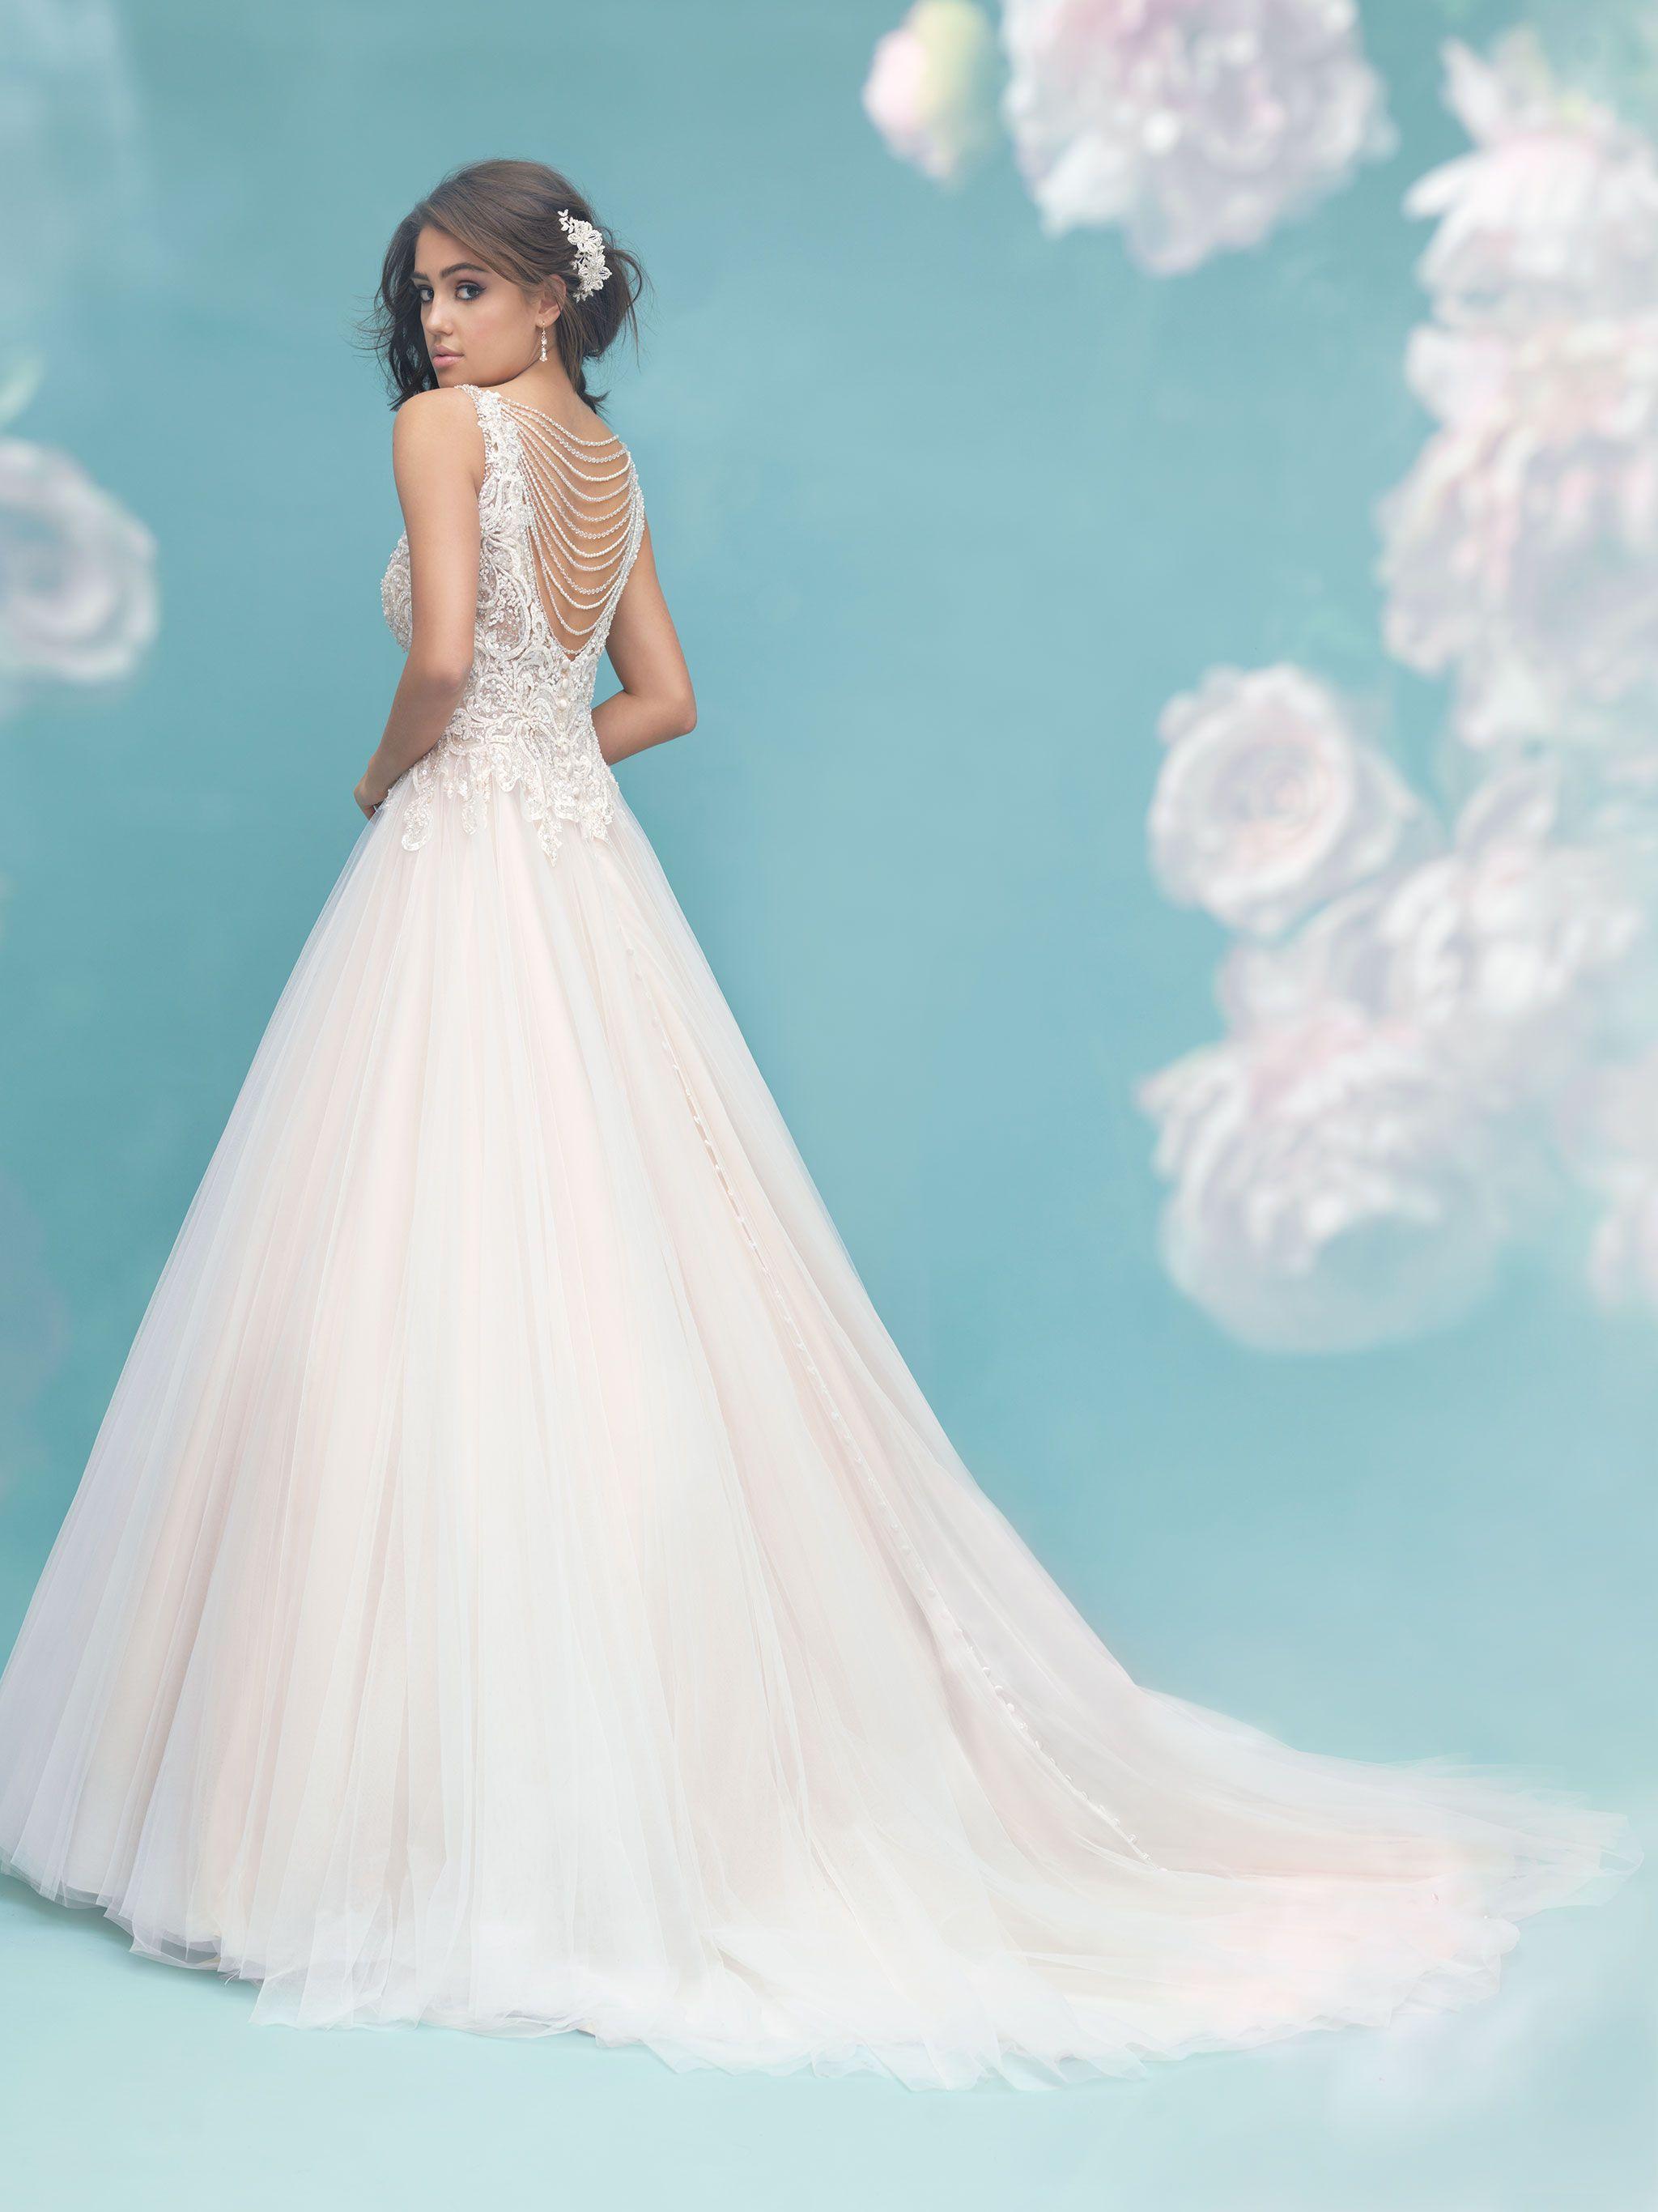 Best Of Plus Size Wedding Dresses El Paso Tx | Wedding